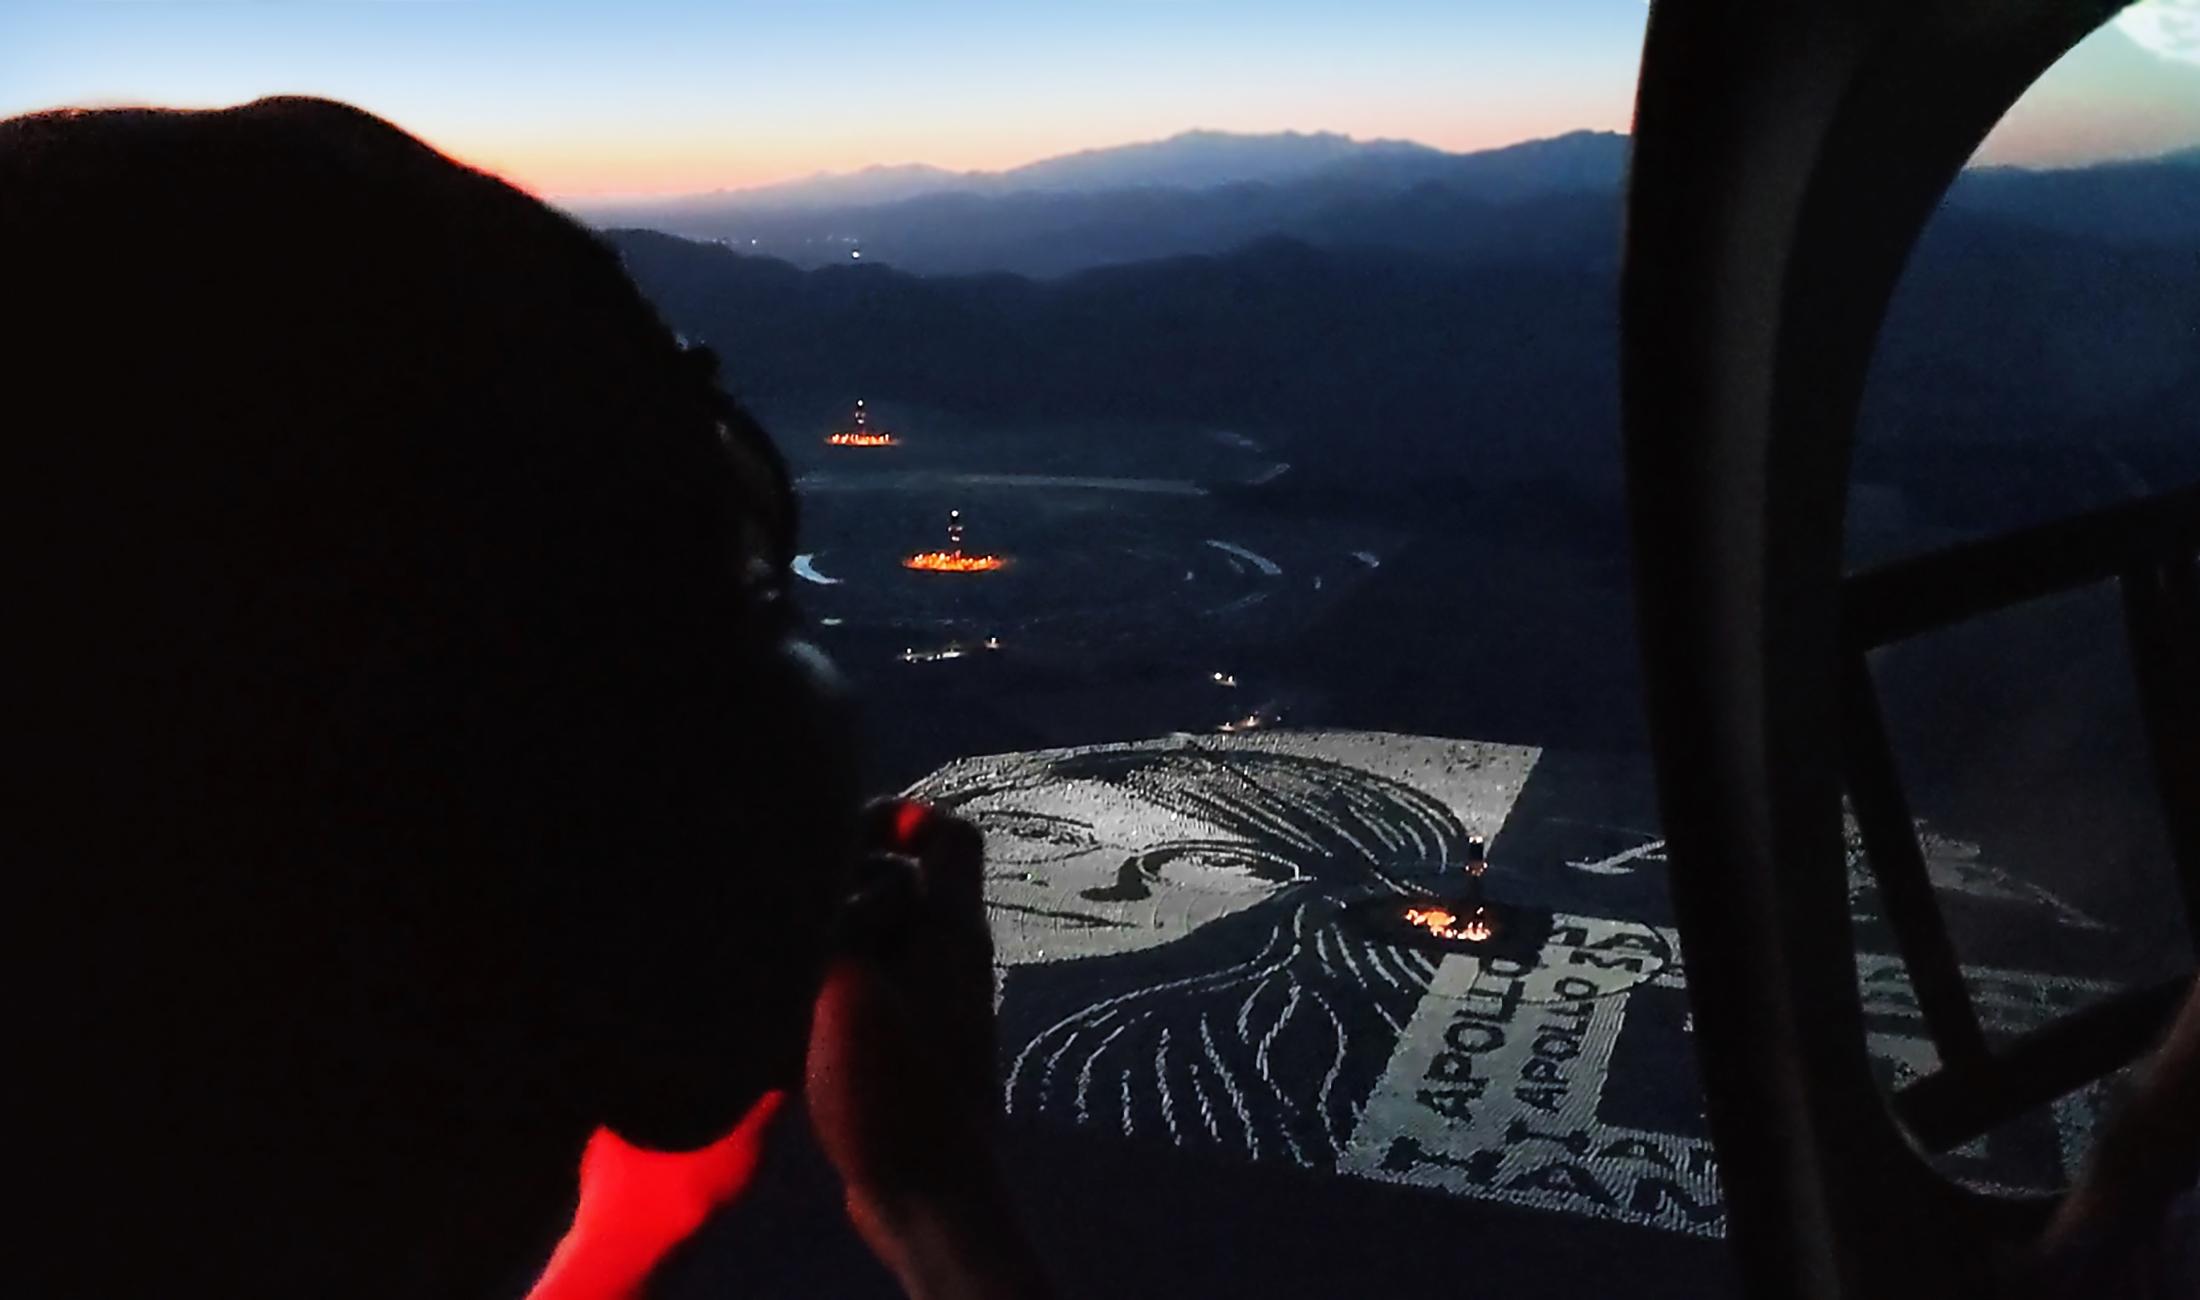 7_9000-feet-above.jpg